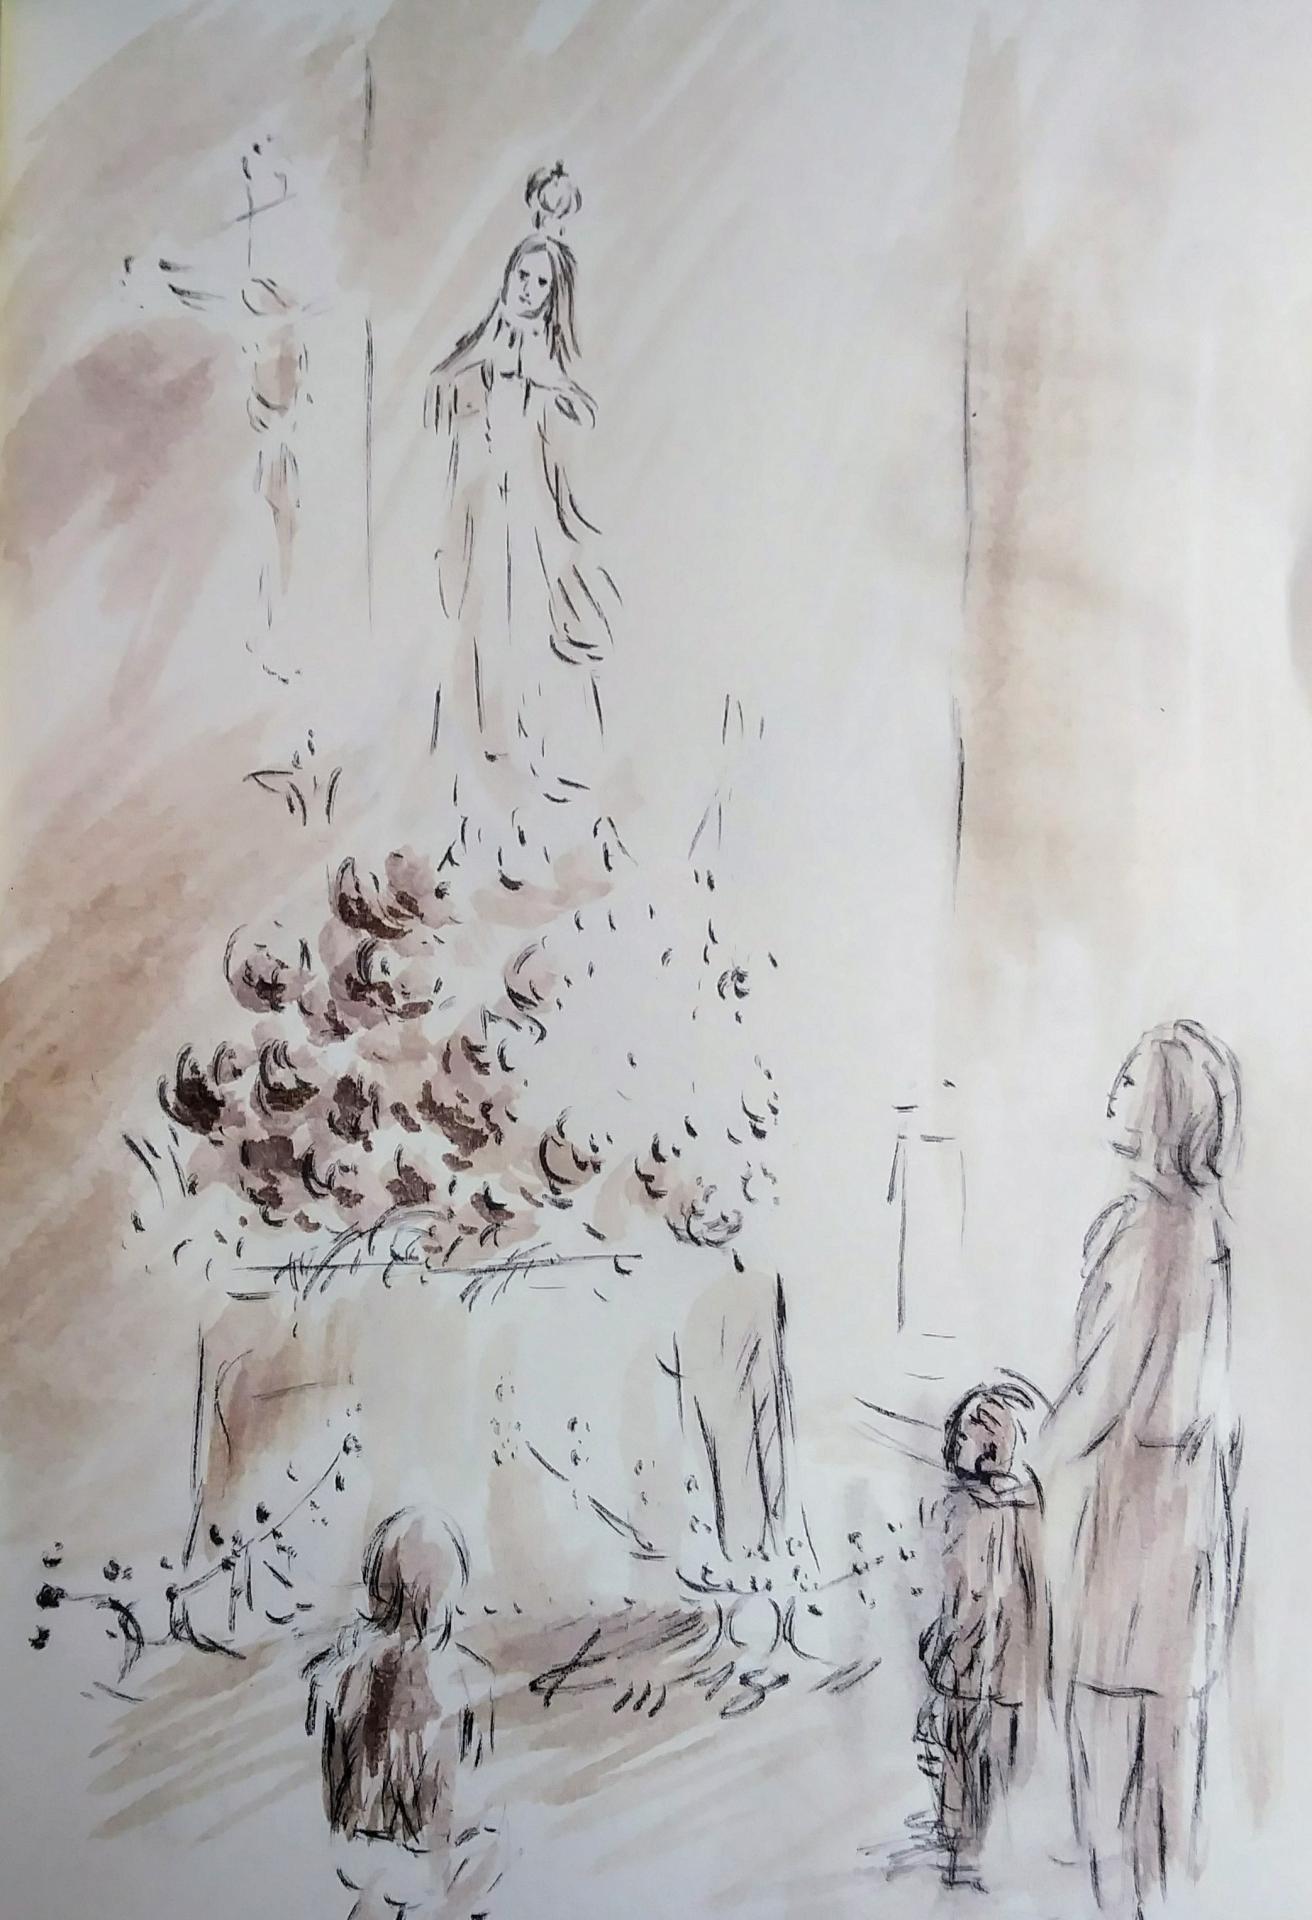 Notre dame de fatima dessin de jean joseph chevaler